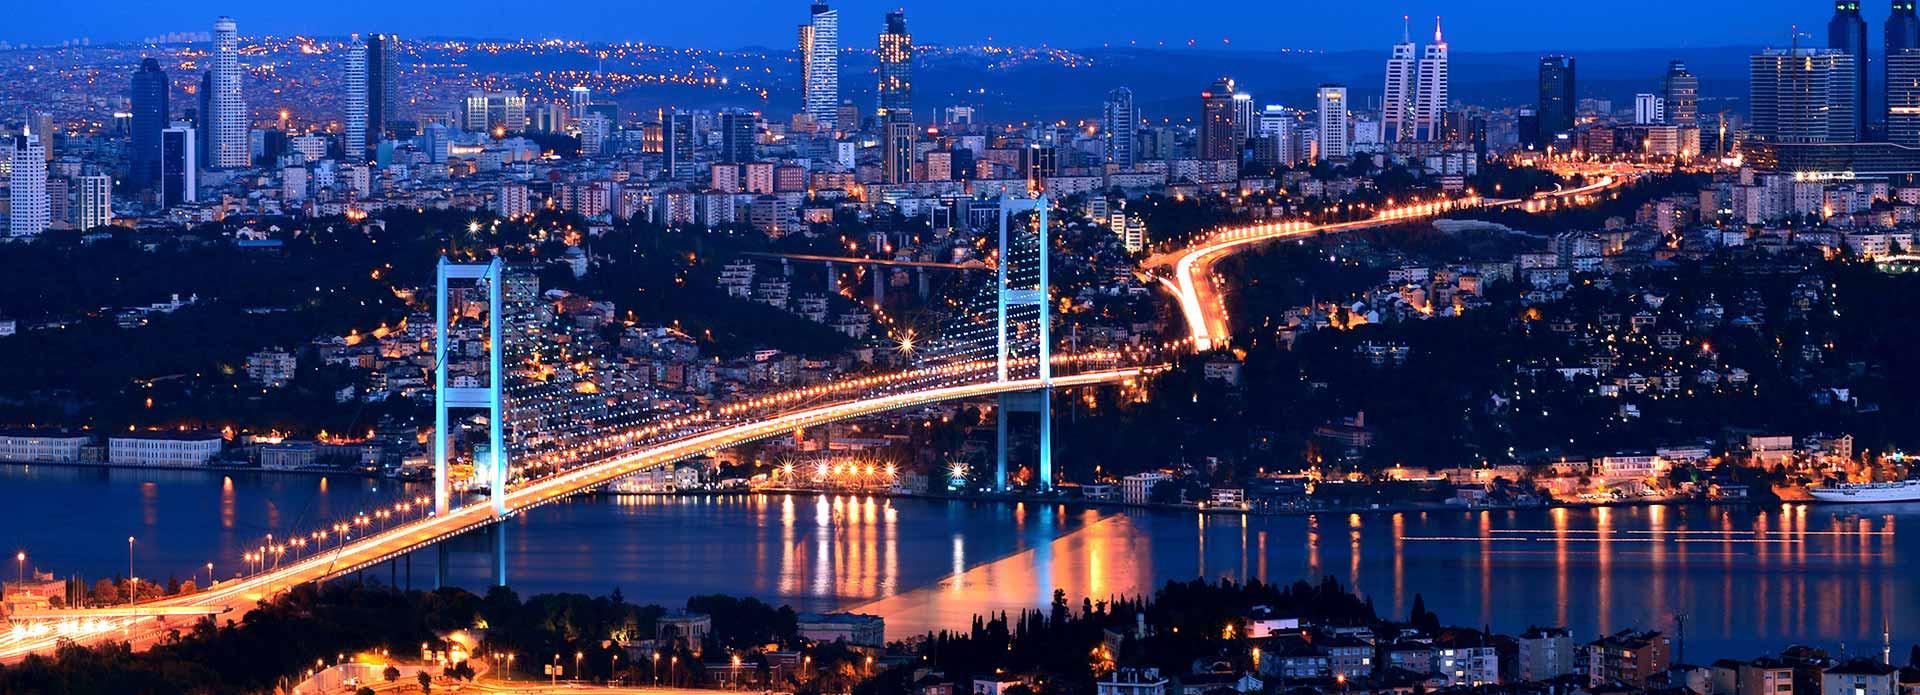 pacotes-de-viagem-para-istambul-egito-cairo-luxor-esna-edfu-kom-ombo-aswan-istambul-egito